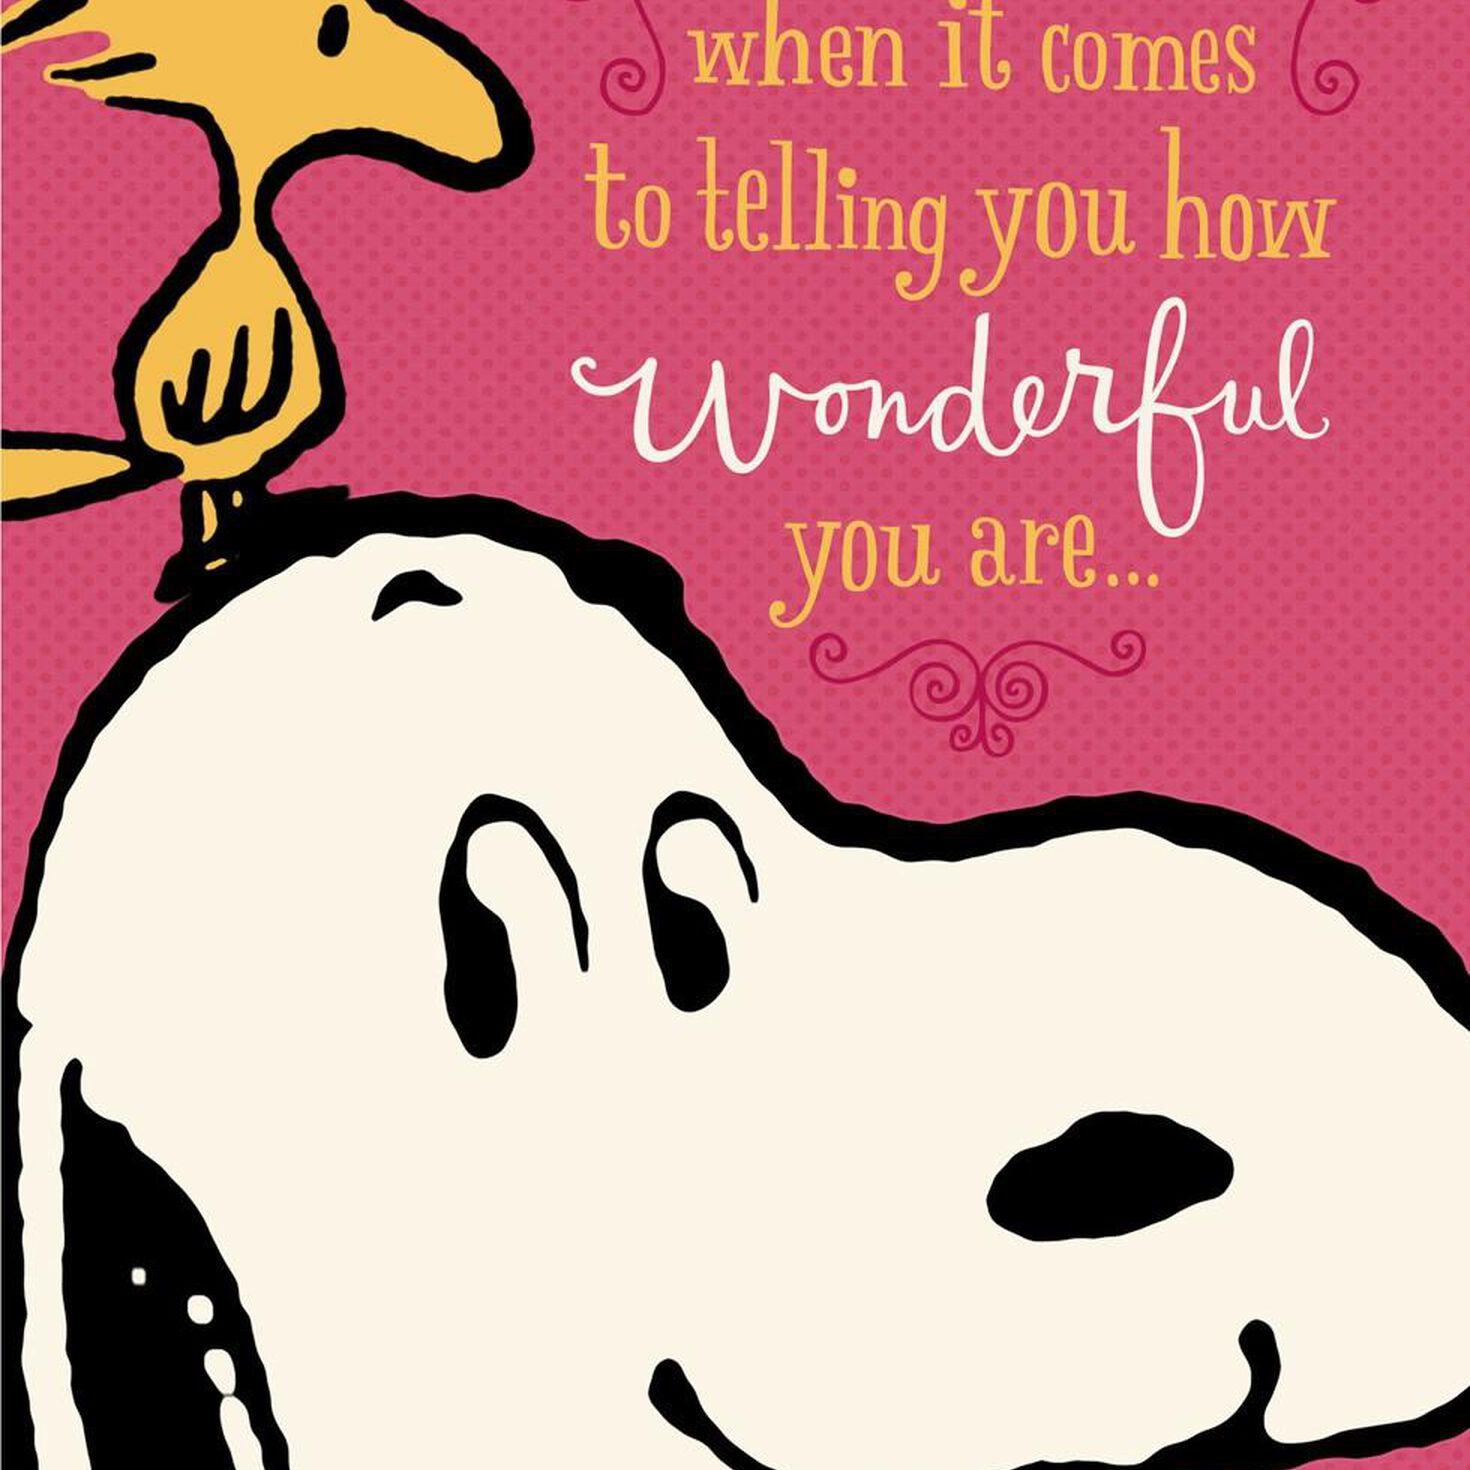 You Re Wonderful: Peanuts® You're Wonderful, Grandma Birthday Card